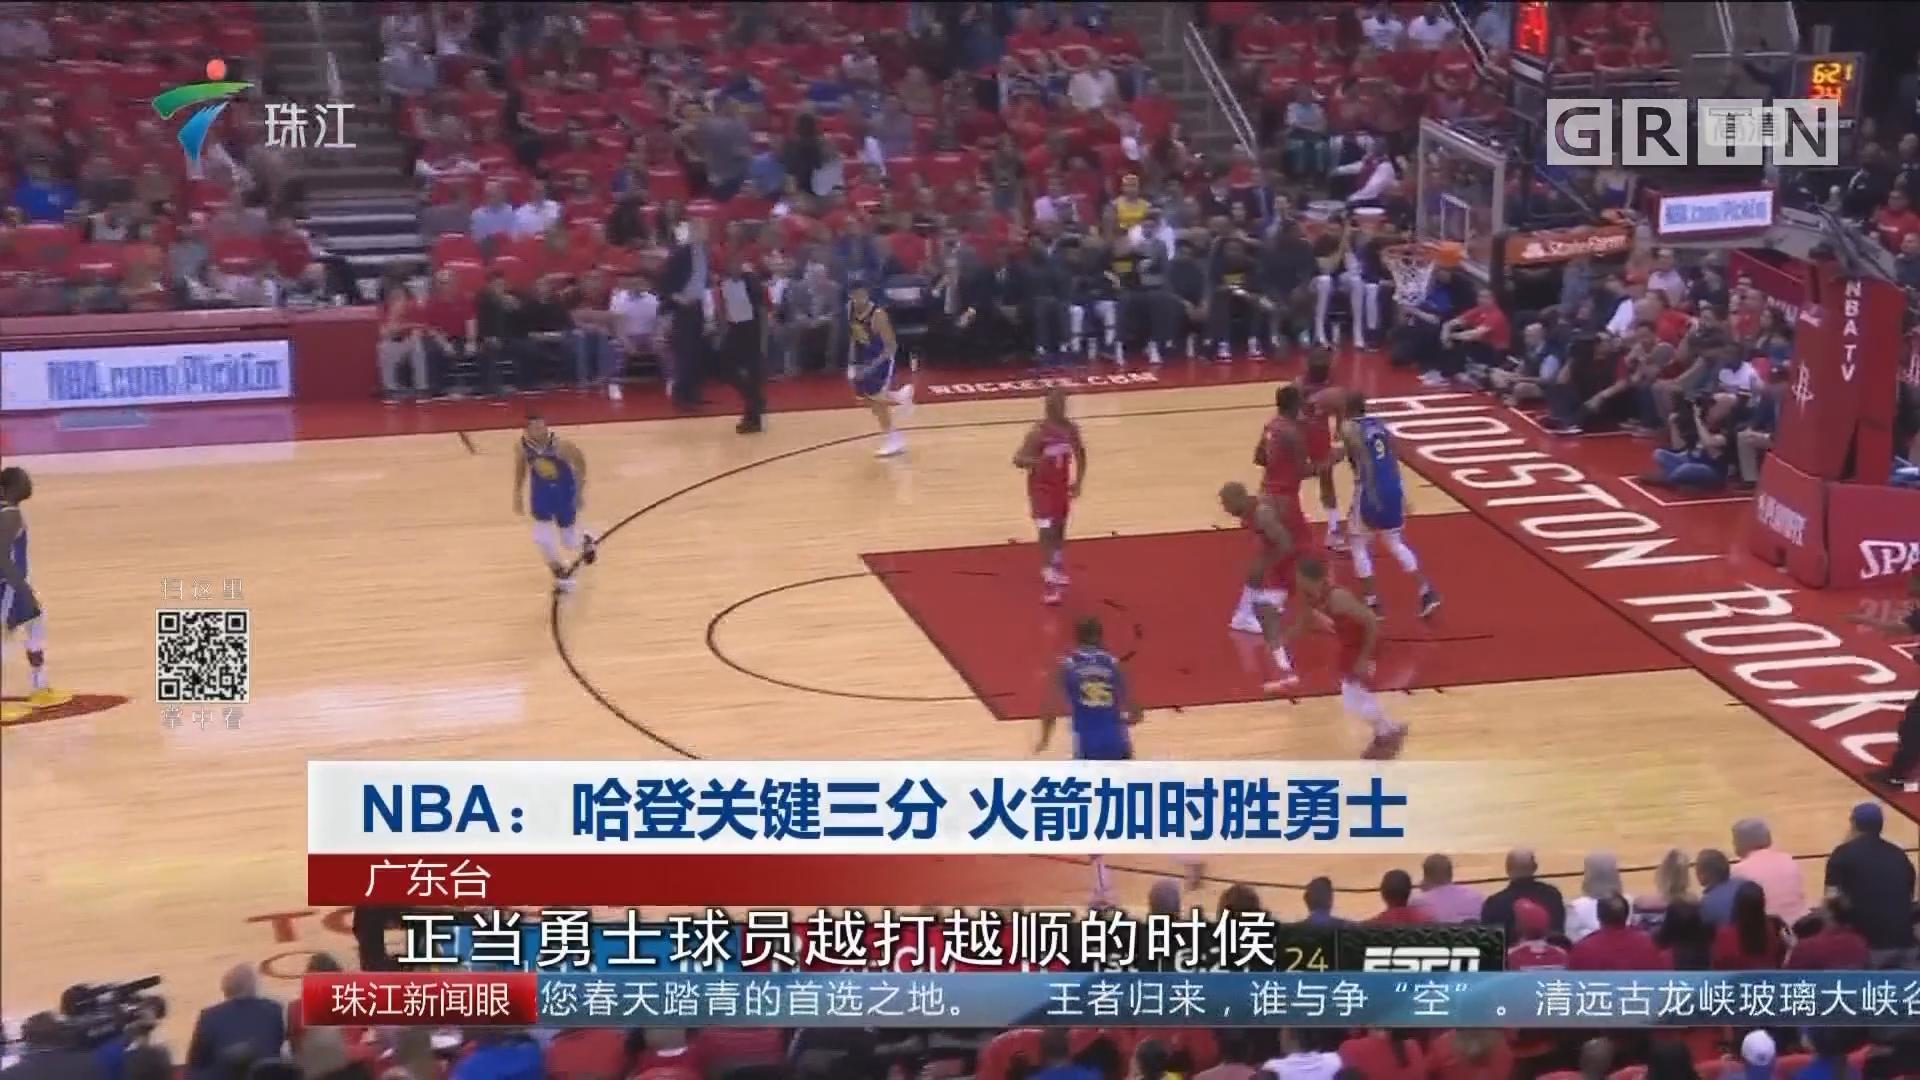 NBA:哈登关键三分 火箭加时胜勇士